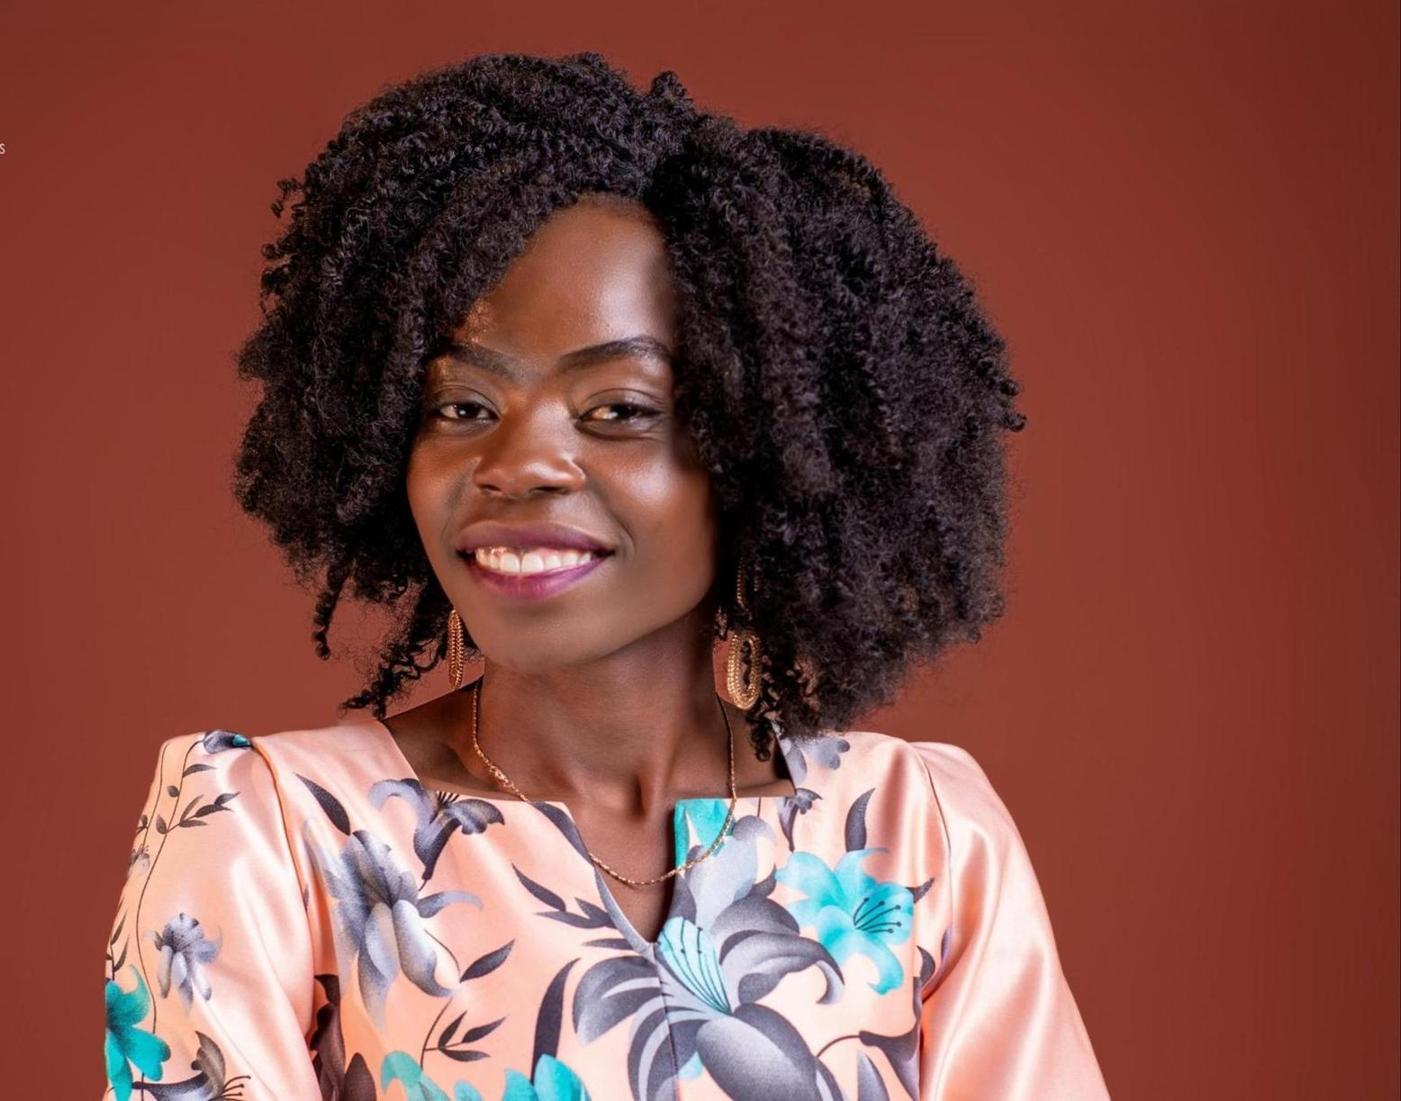 Esther gives hope in new single 'Ndine Wamwayi'